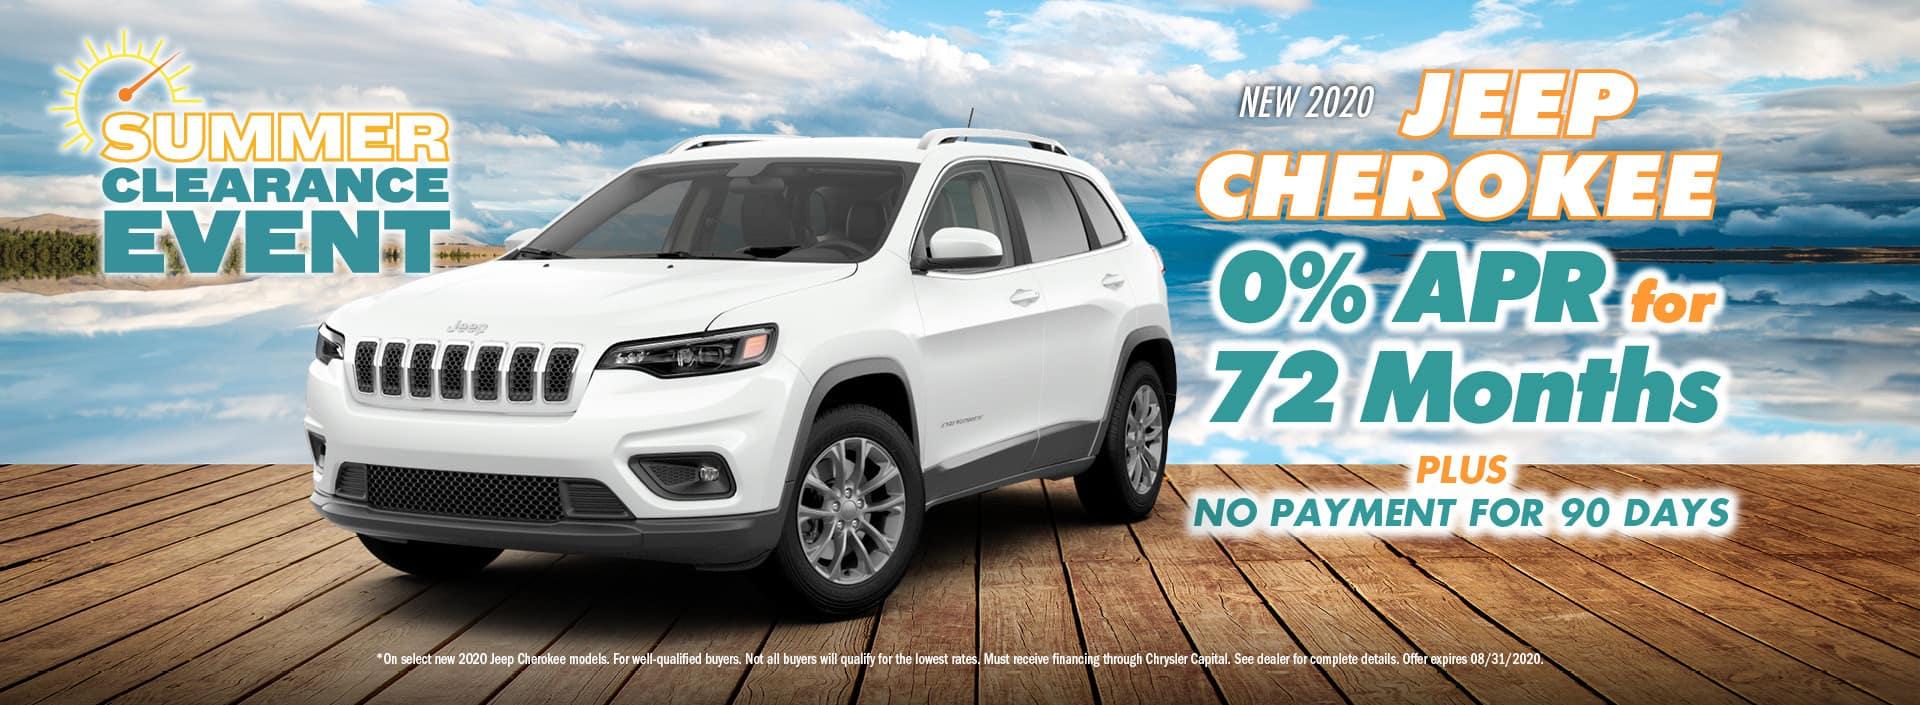 Summer 2020 Jeep Cherokee